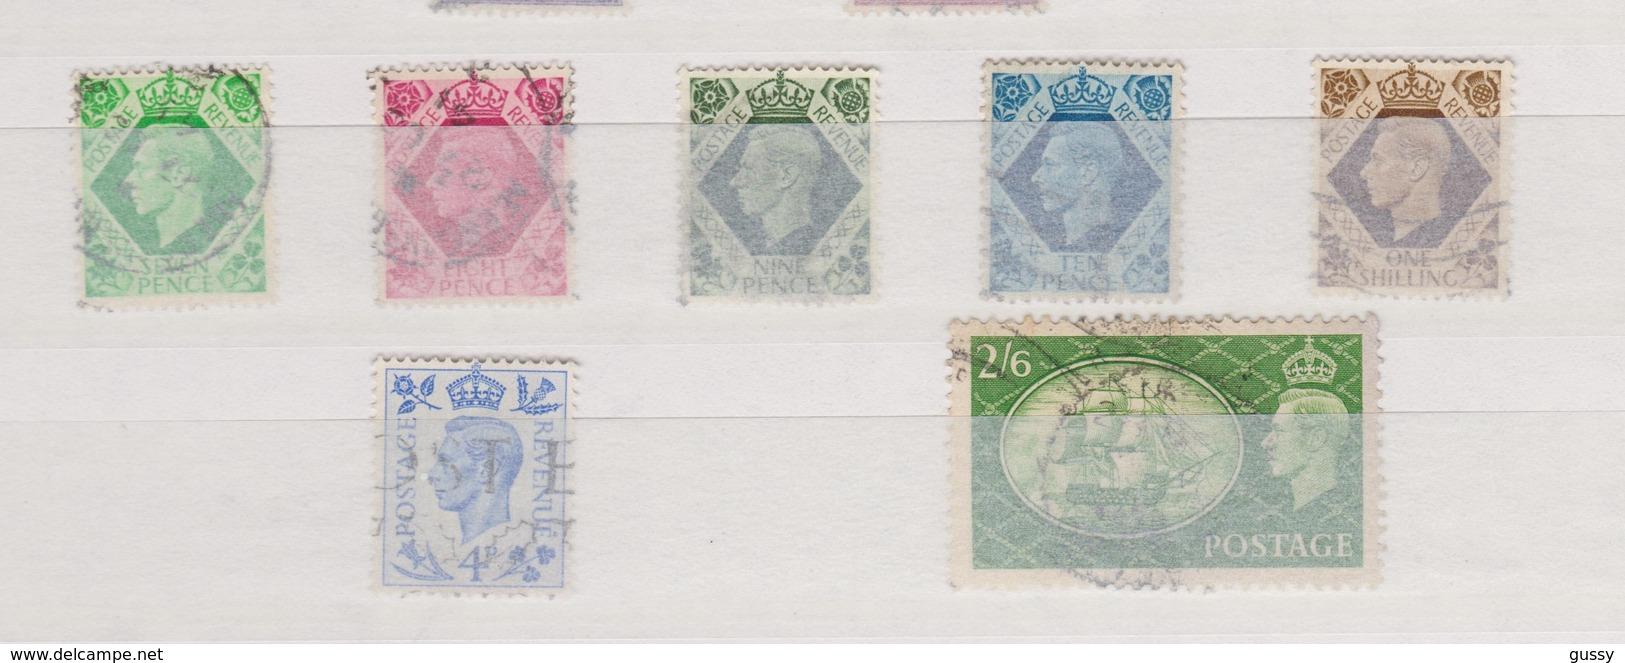 GRANDE BRETAGNE 1837-52:  Roi George VI, Petit Lot De Timbres Oblitérés - 1840-1901 (Viktoria)